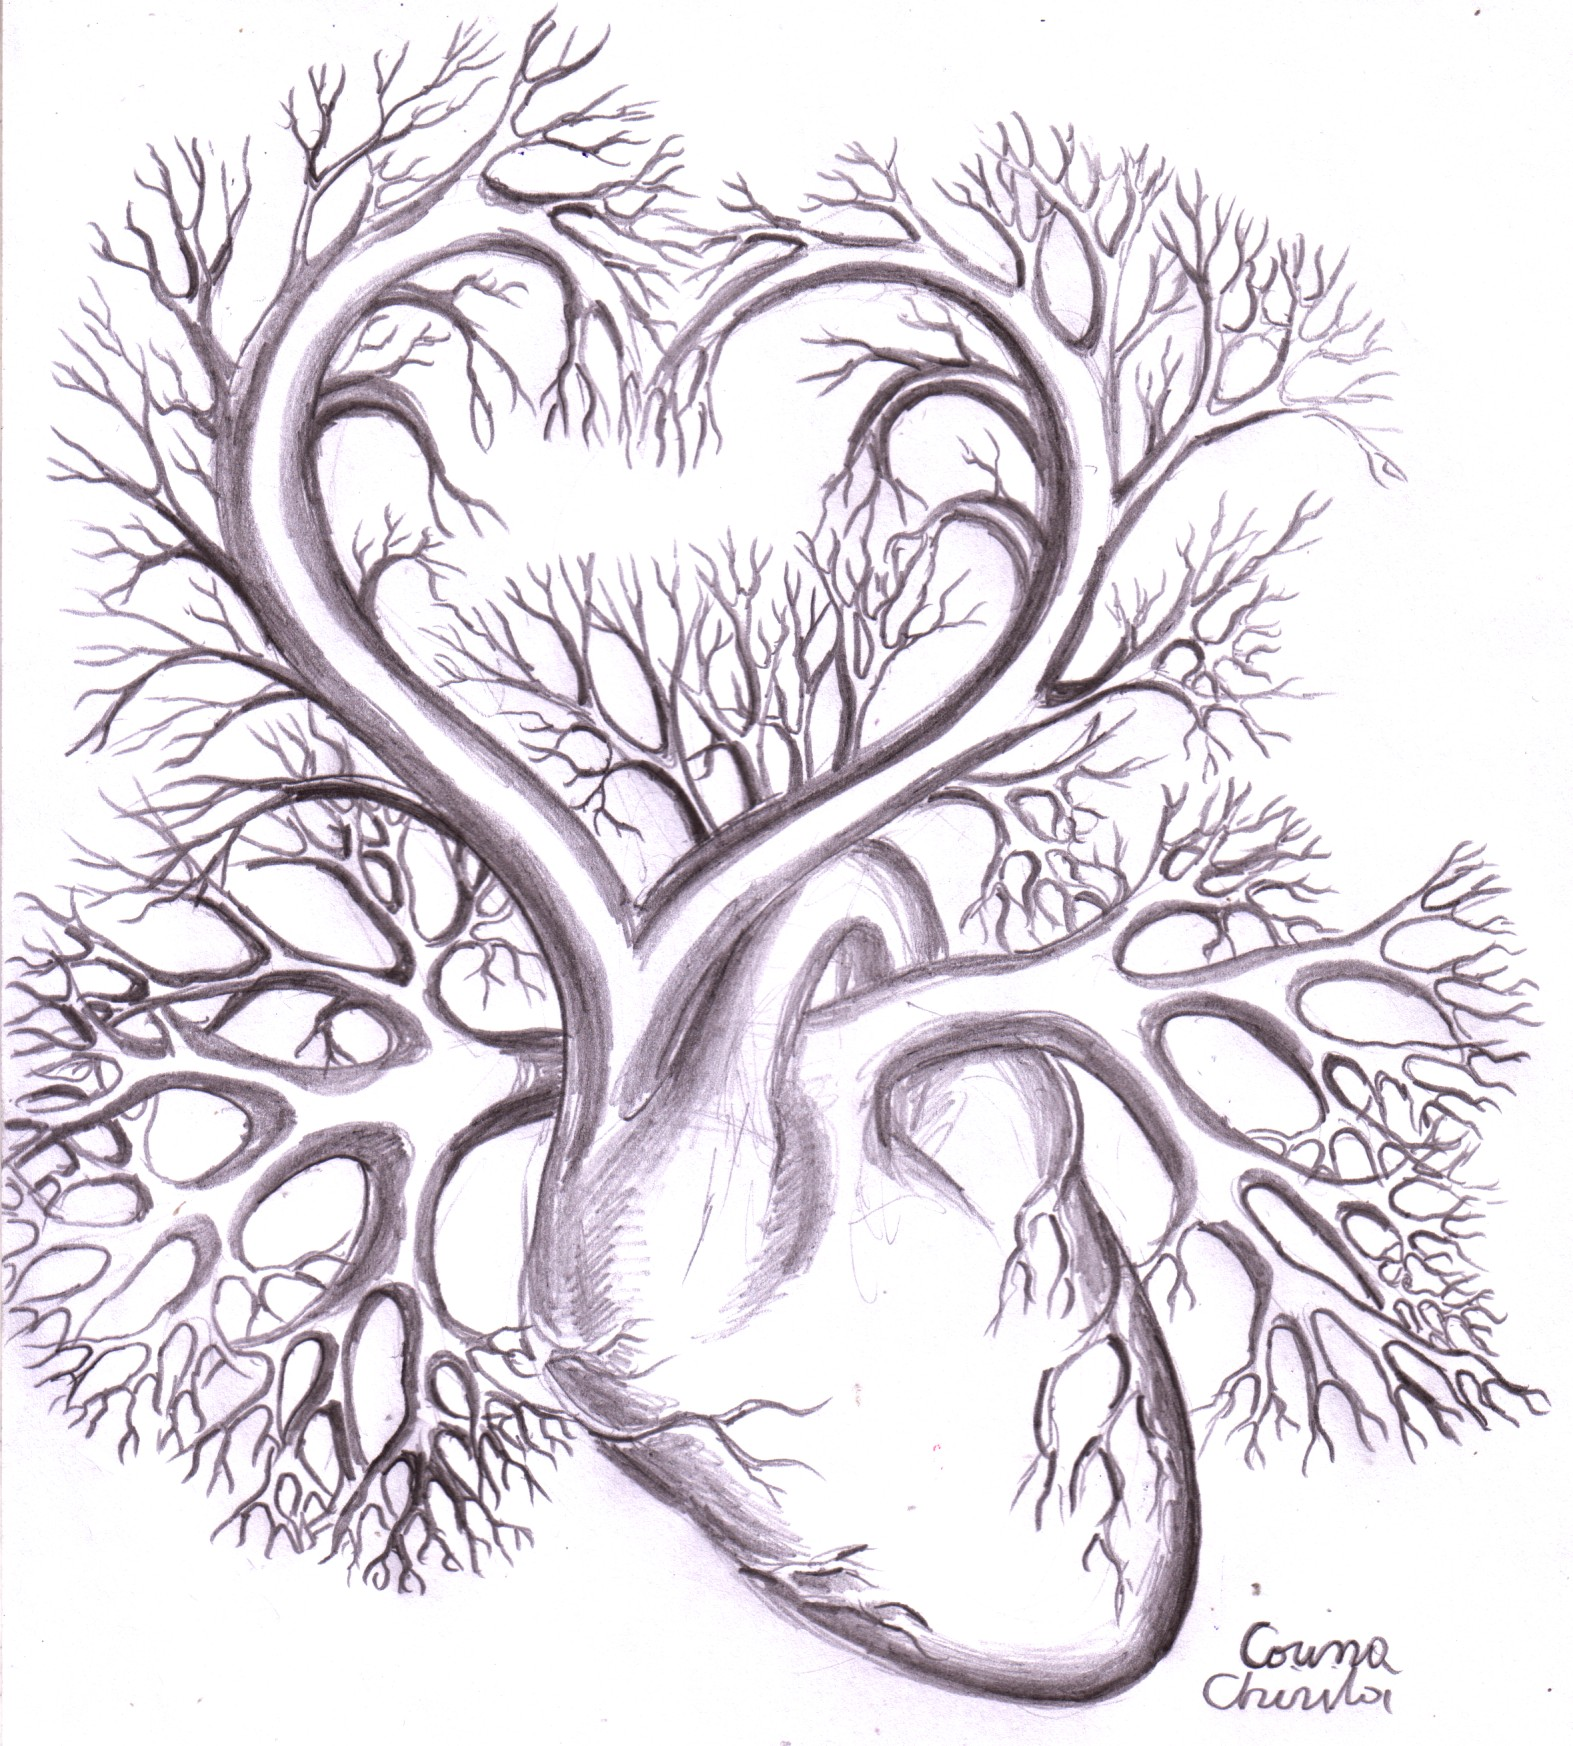 Free Pencil Art Love Heart Download Free Clip Art Free Clip Art On Clipart Library